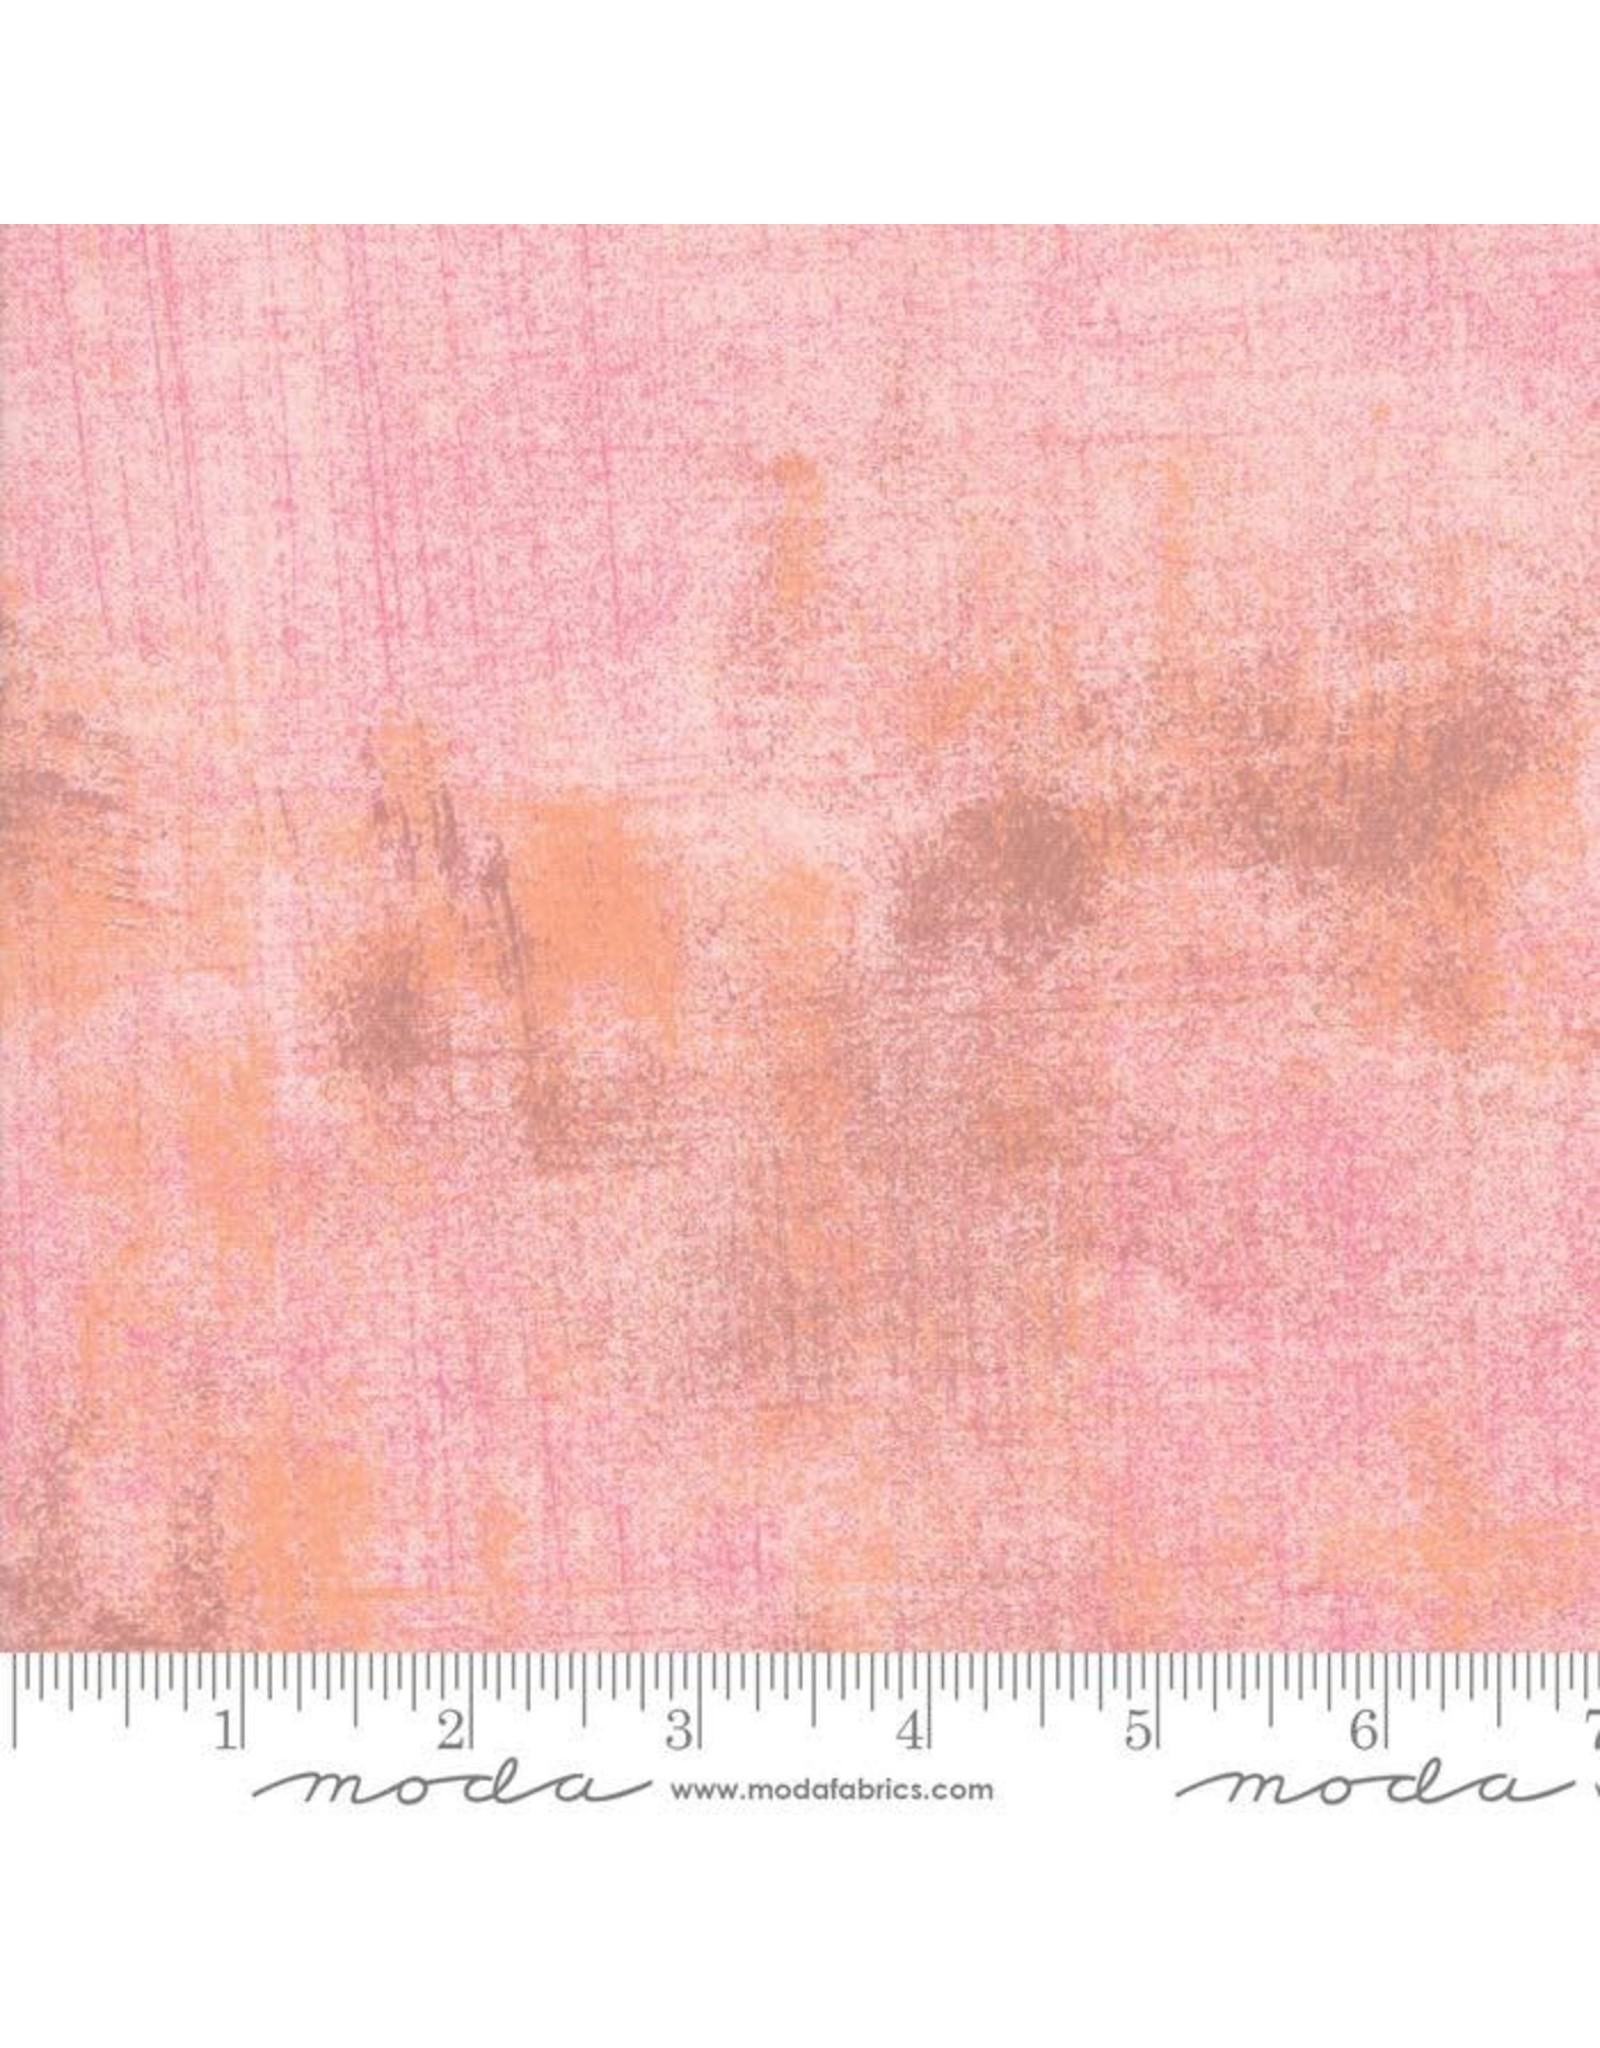 Moda Grunge in Sweetie, Fabric Half-Yards